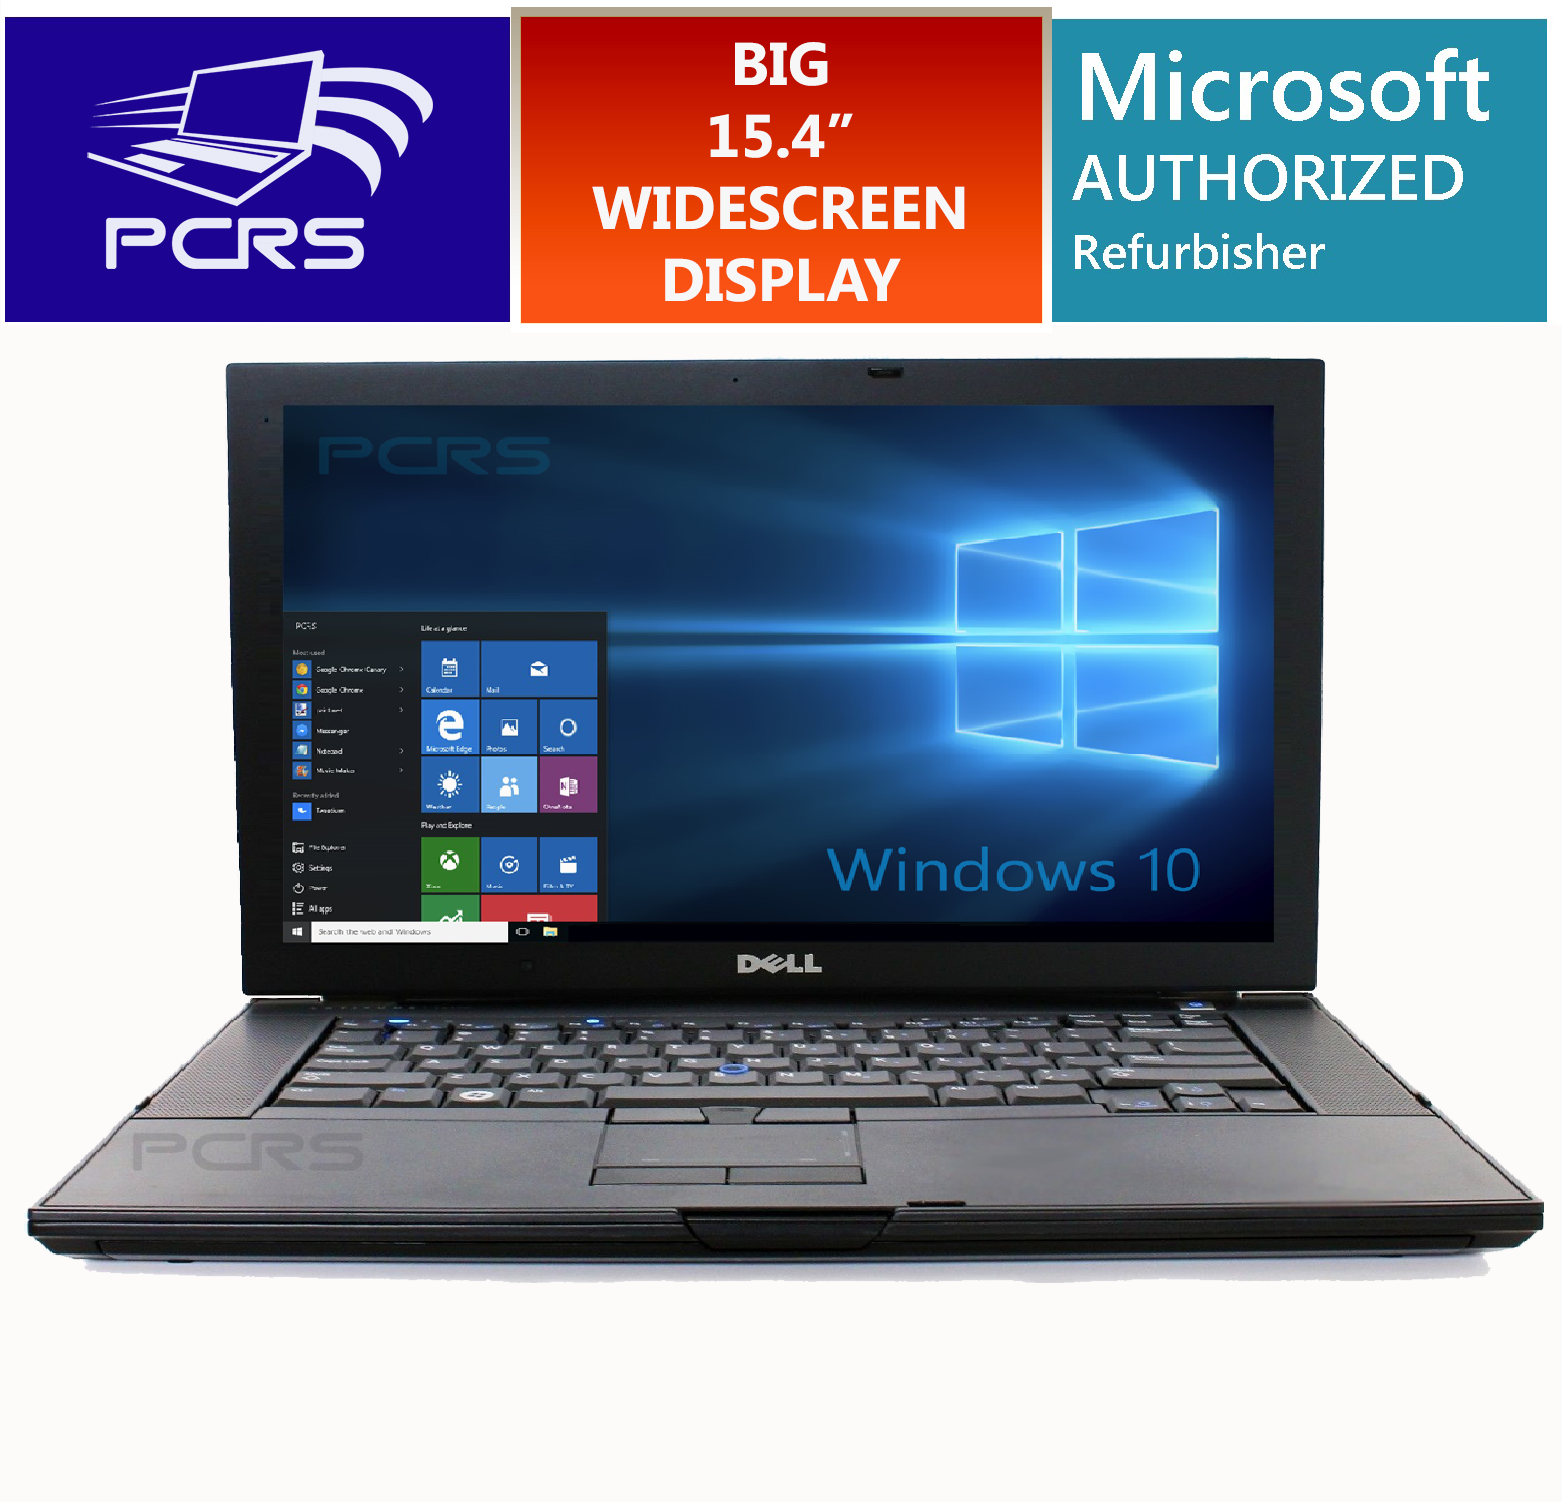 "Laptop - DELL LATiTUDE LAPTOP 15.4"" HD Widescreen Computer Windows 10 Intel Core Duo 2GHz"